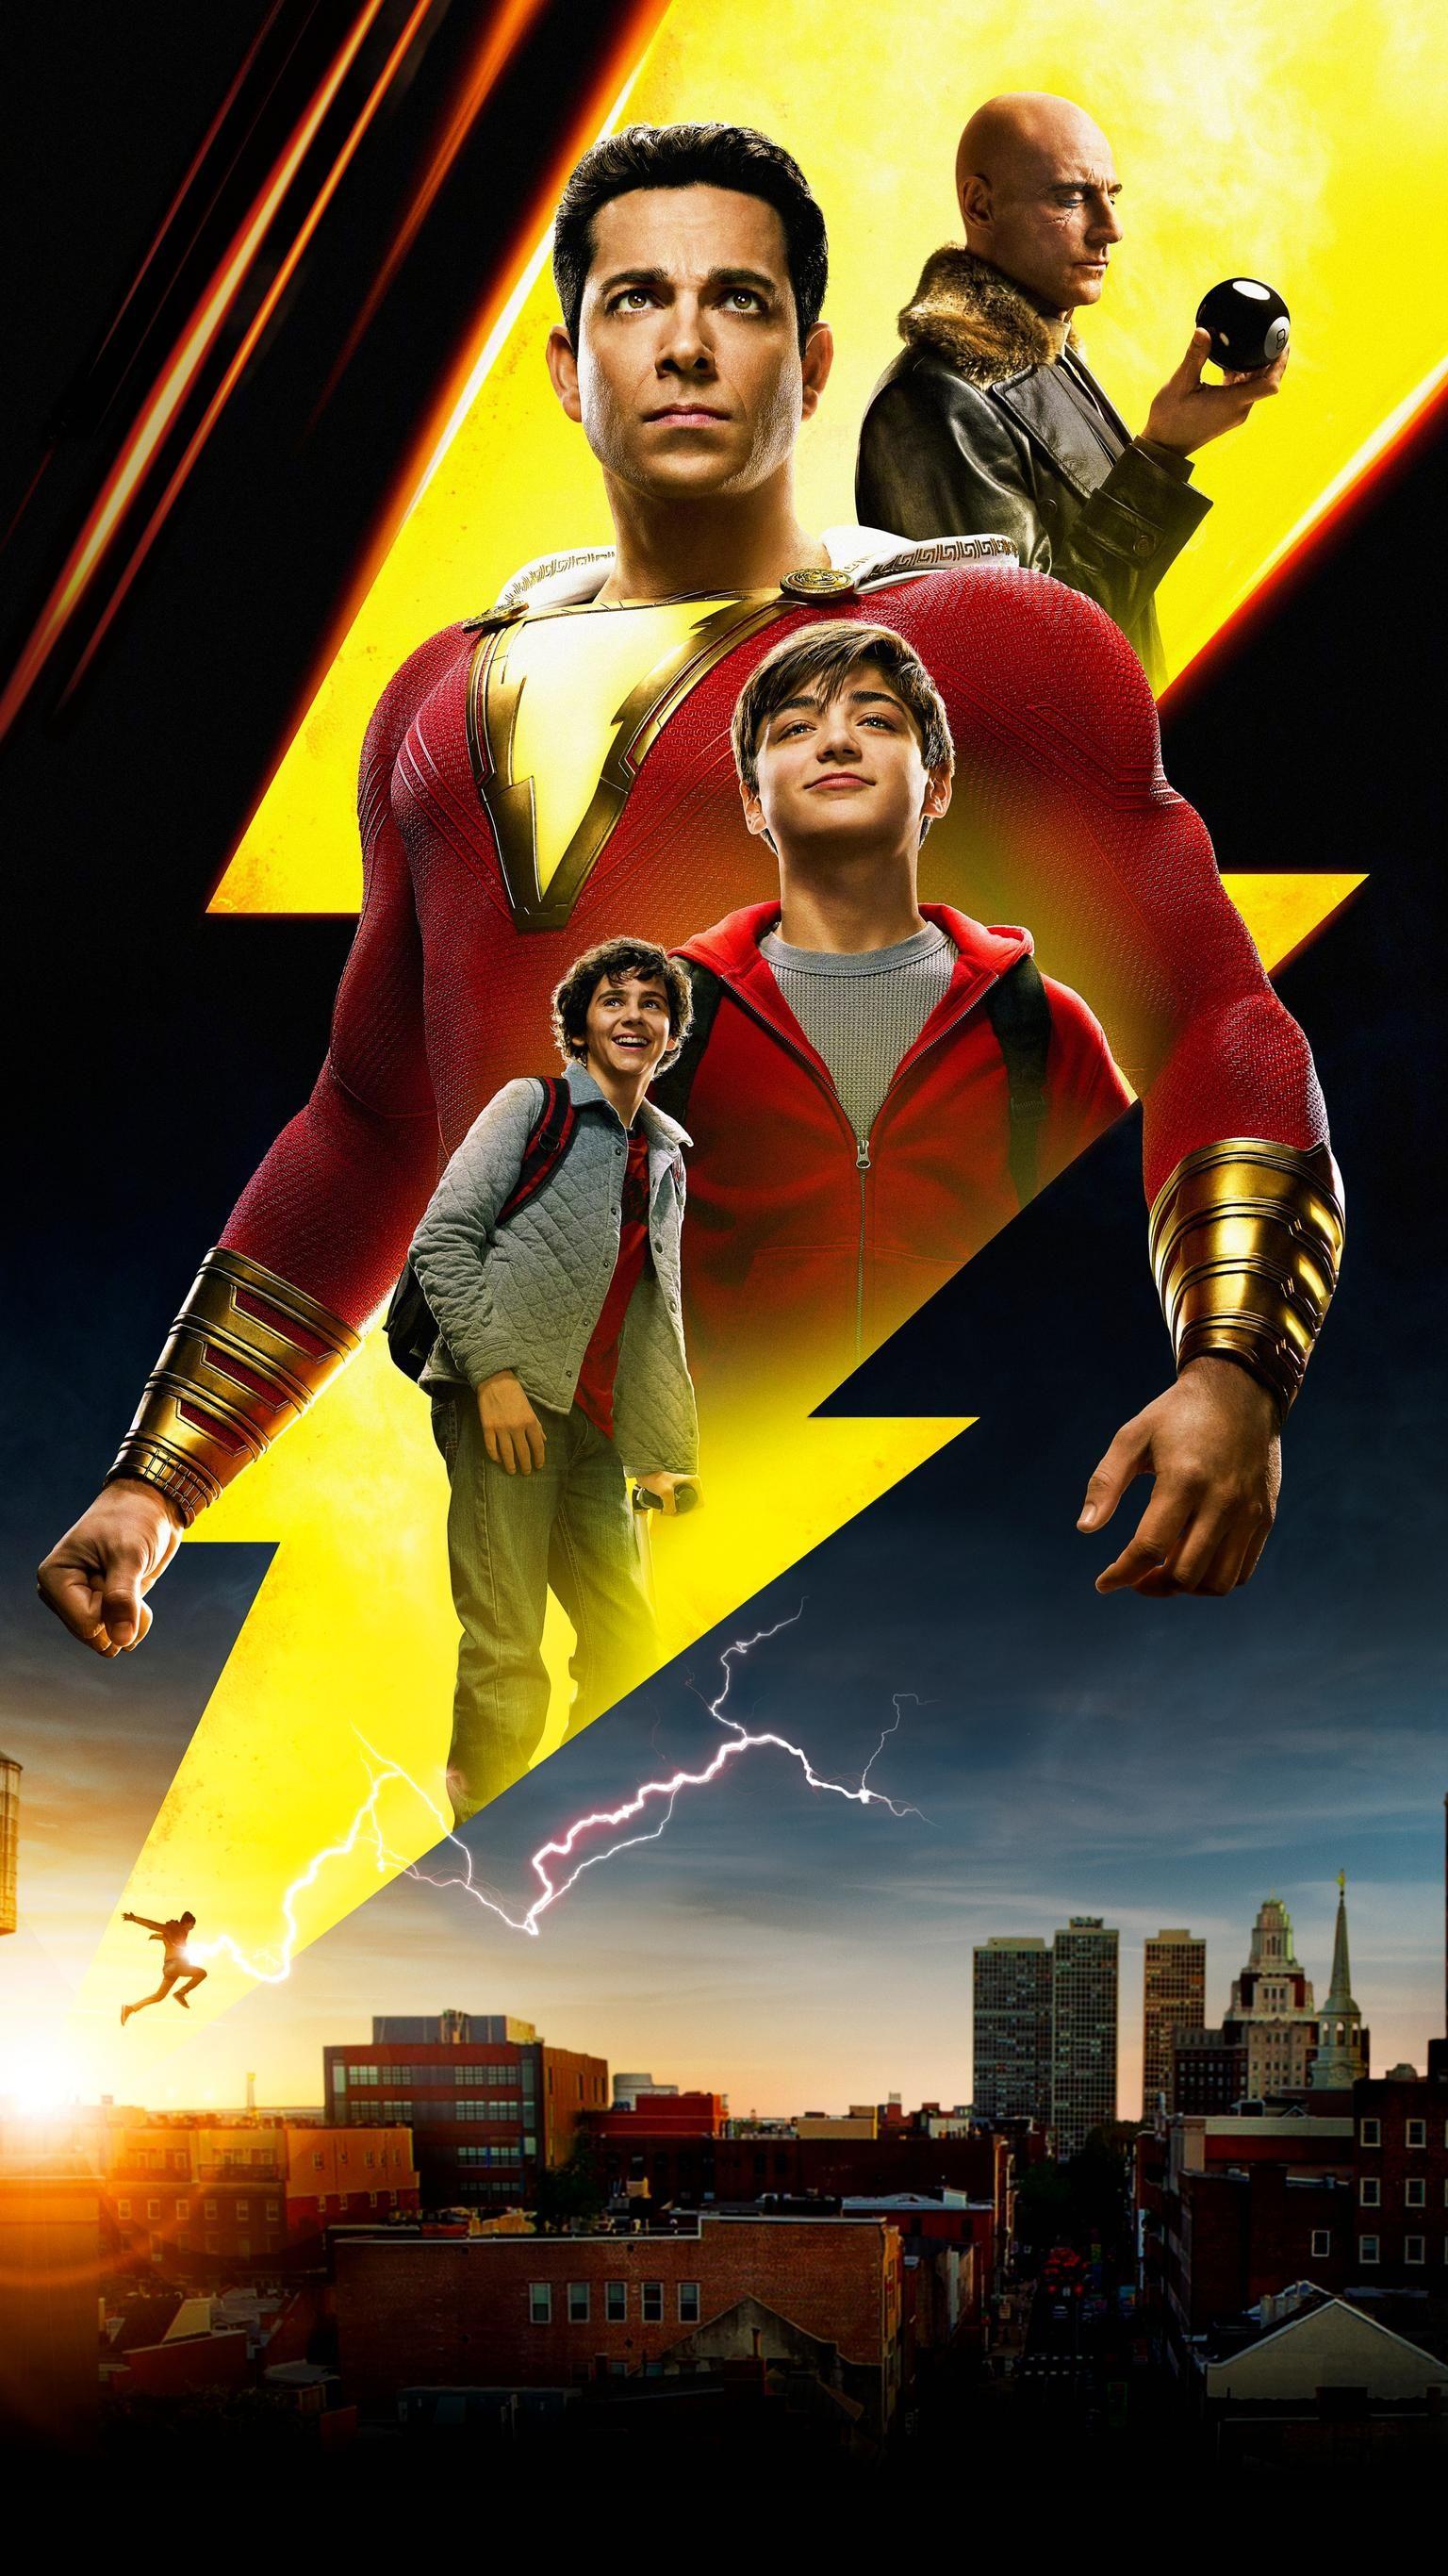 Shazam 2019 Phone Wallpaper Moviemania Shazam Movie Captain Marvel Shazam Shazam